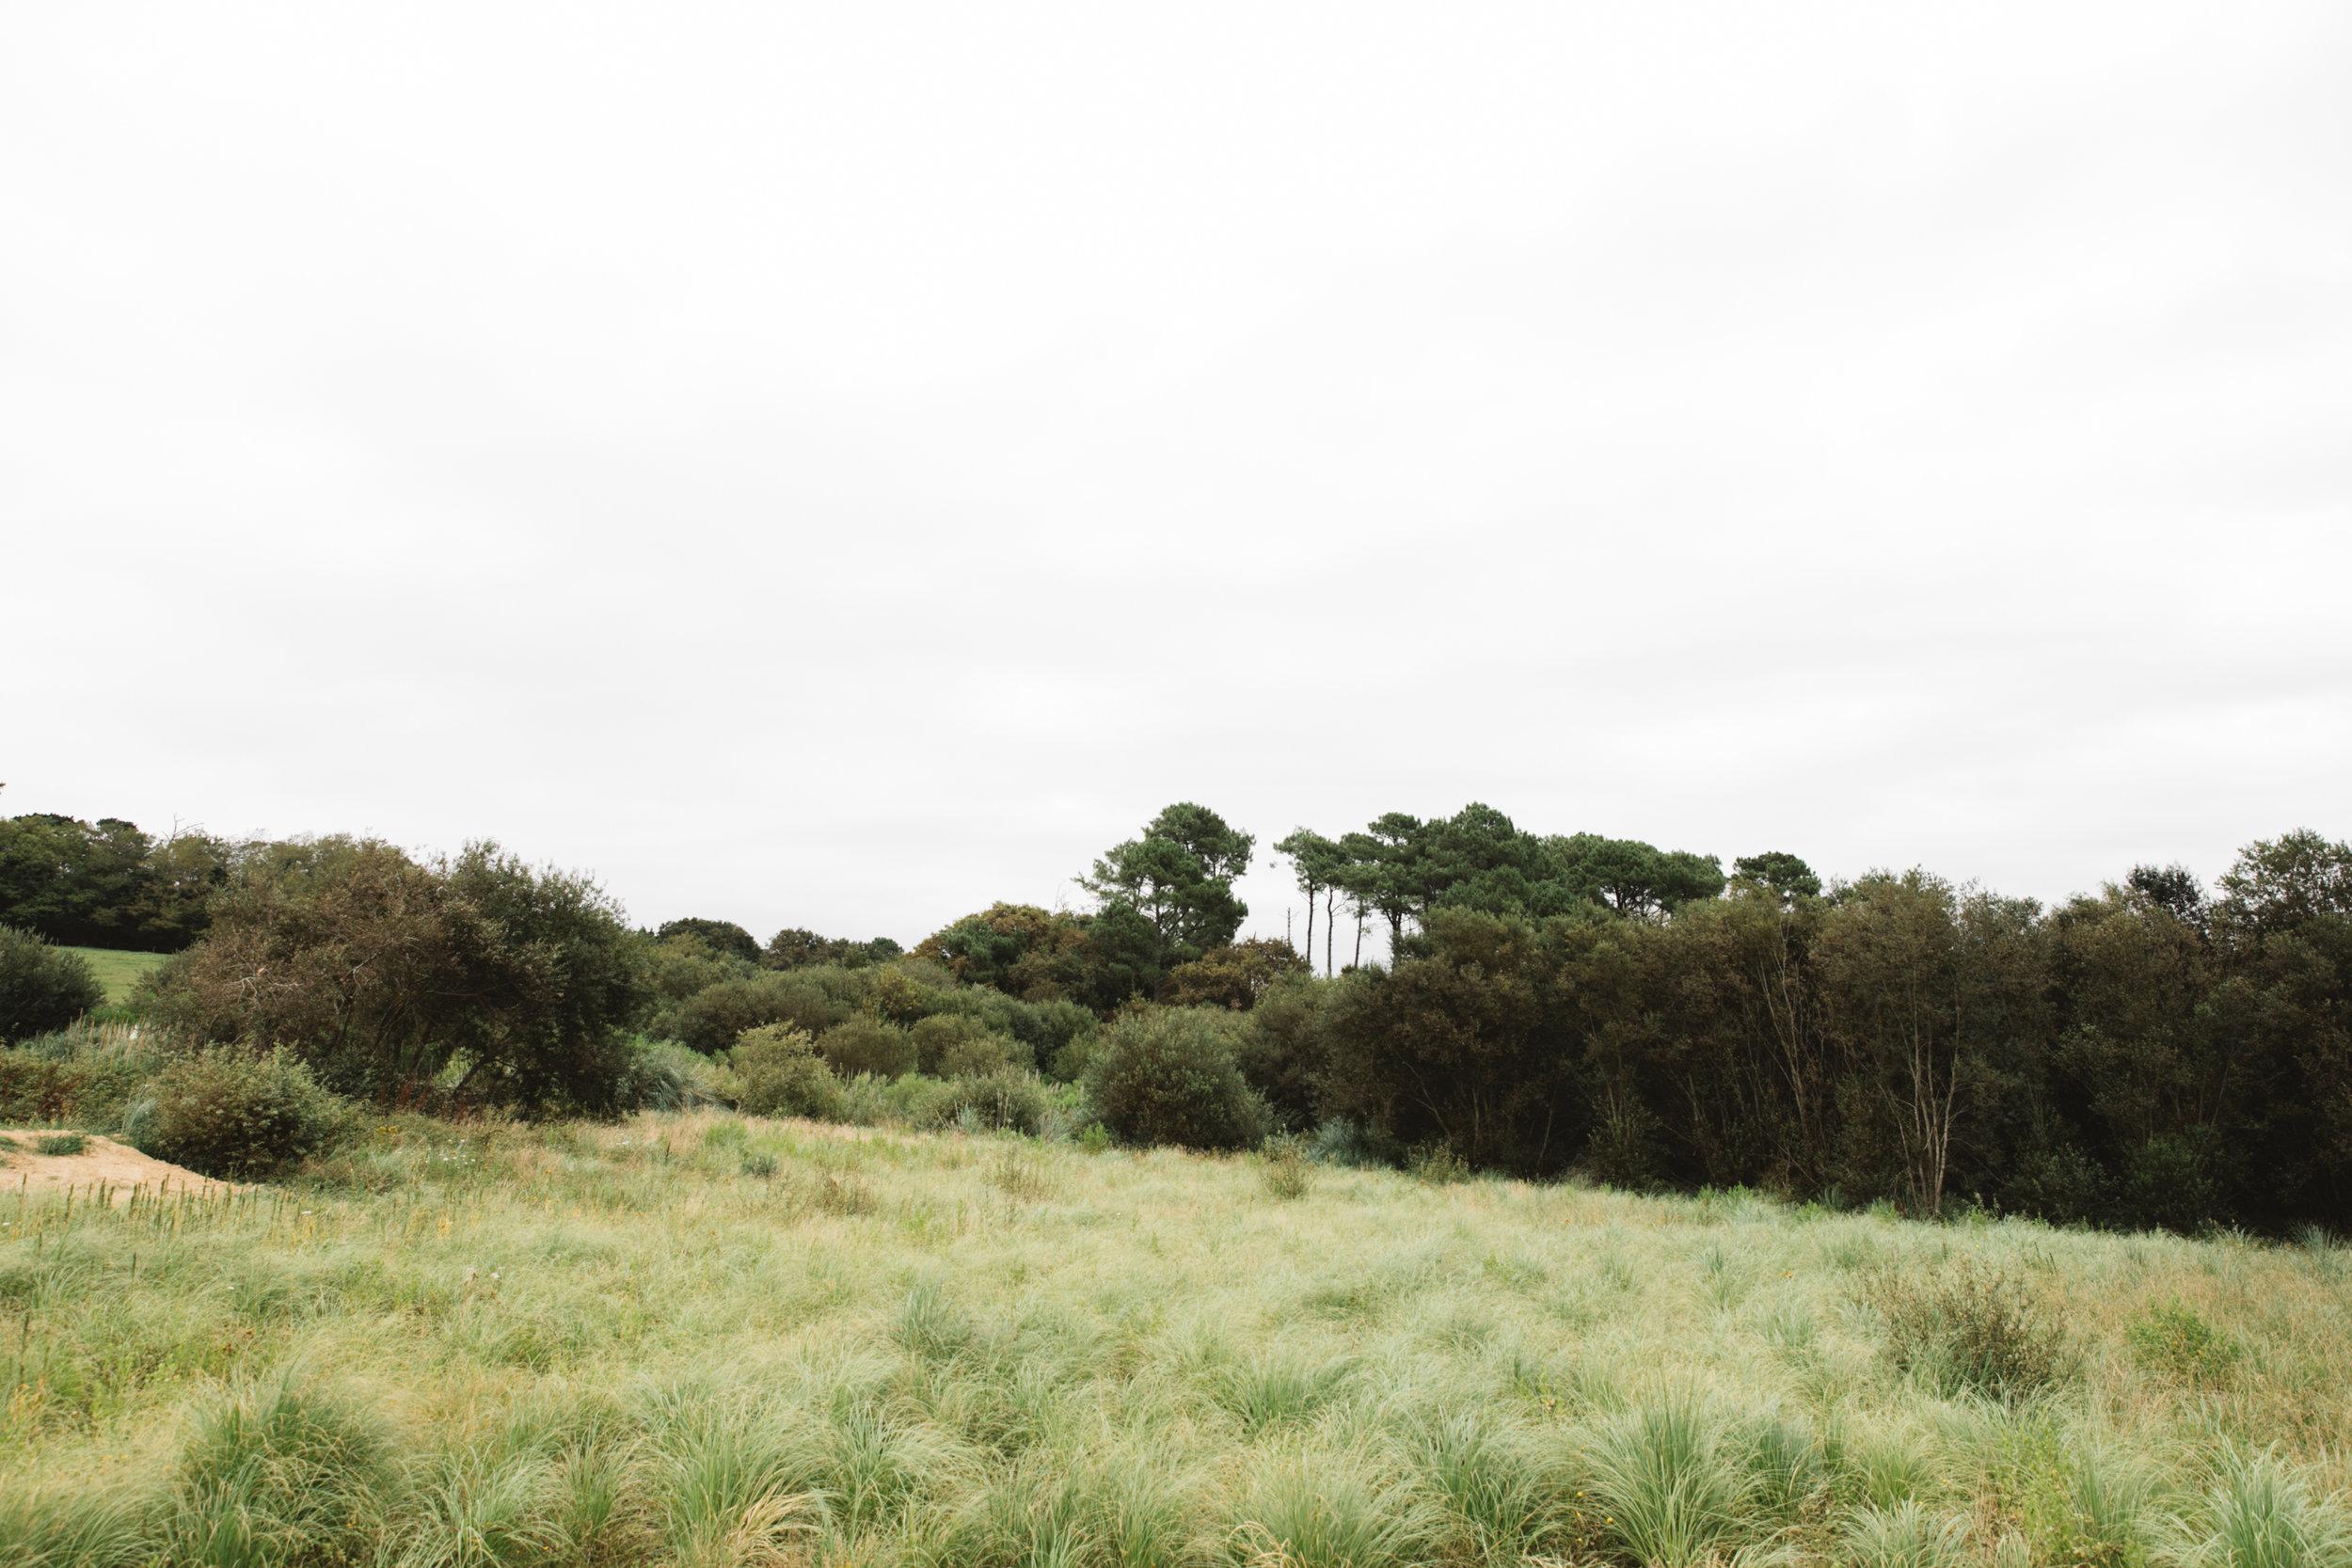 Louise_french_baguette_landscapes-6.jpg